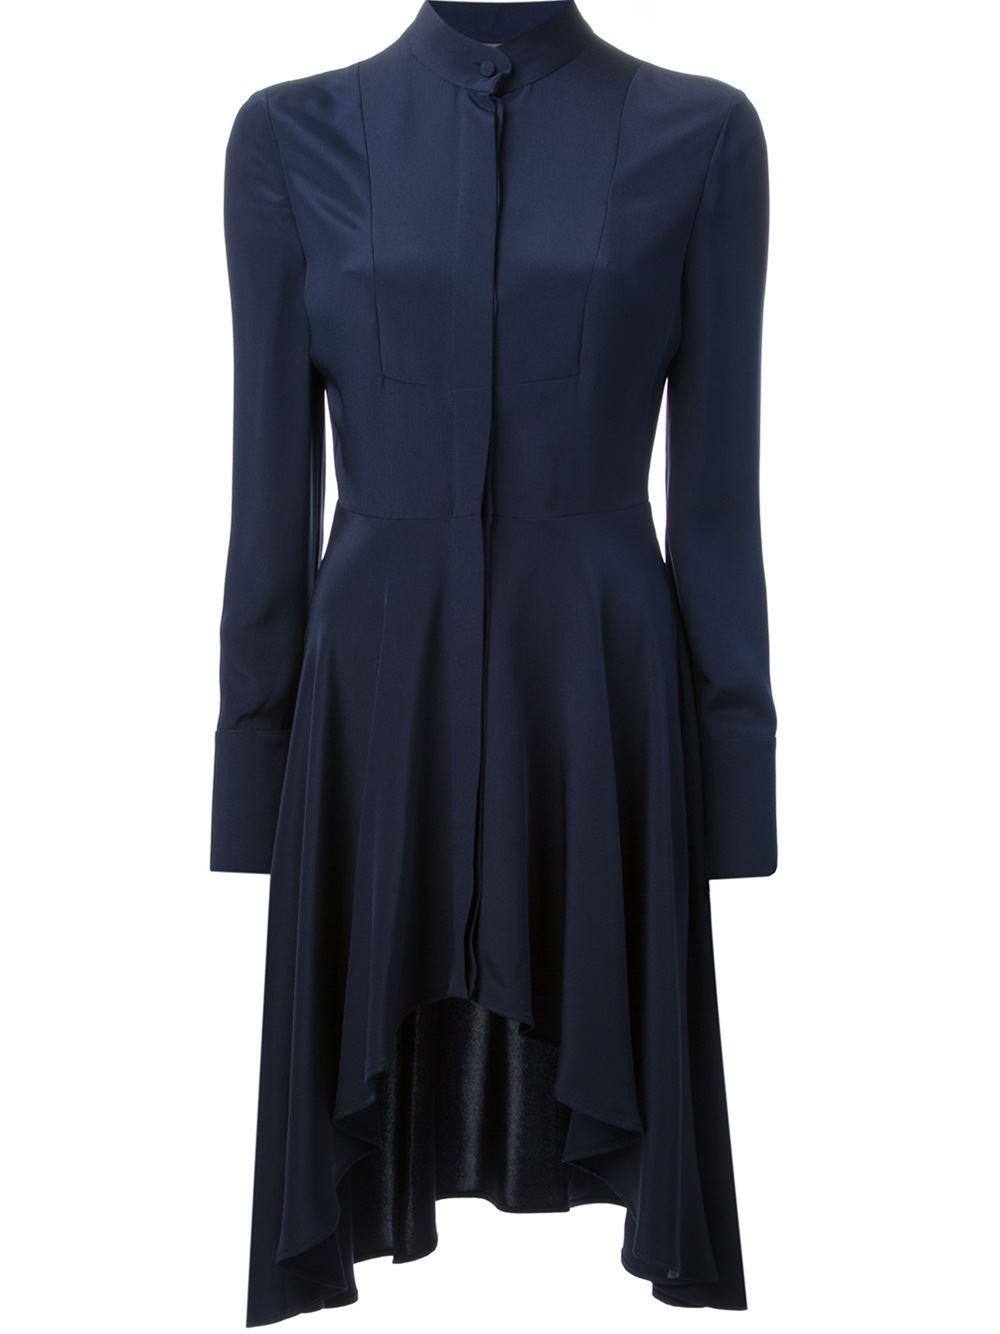 Lyst alexander mcqueen waterfall hem dress in blue for Waterfall design dress